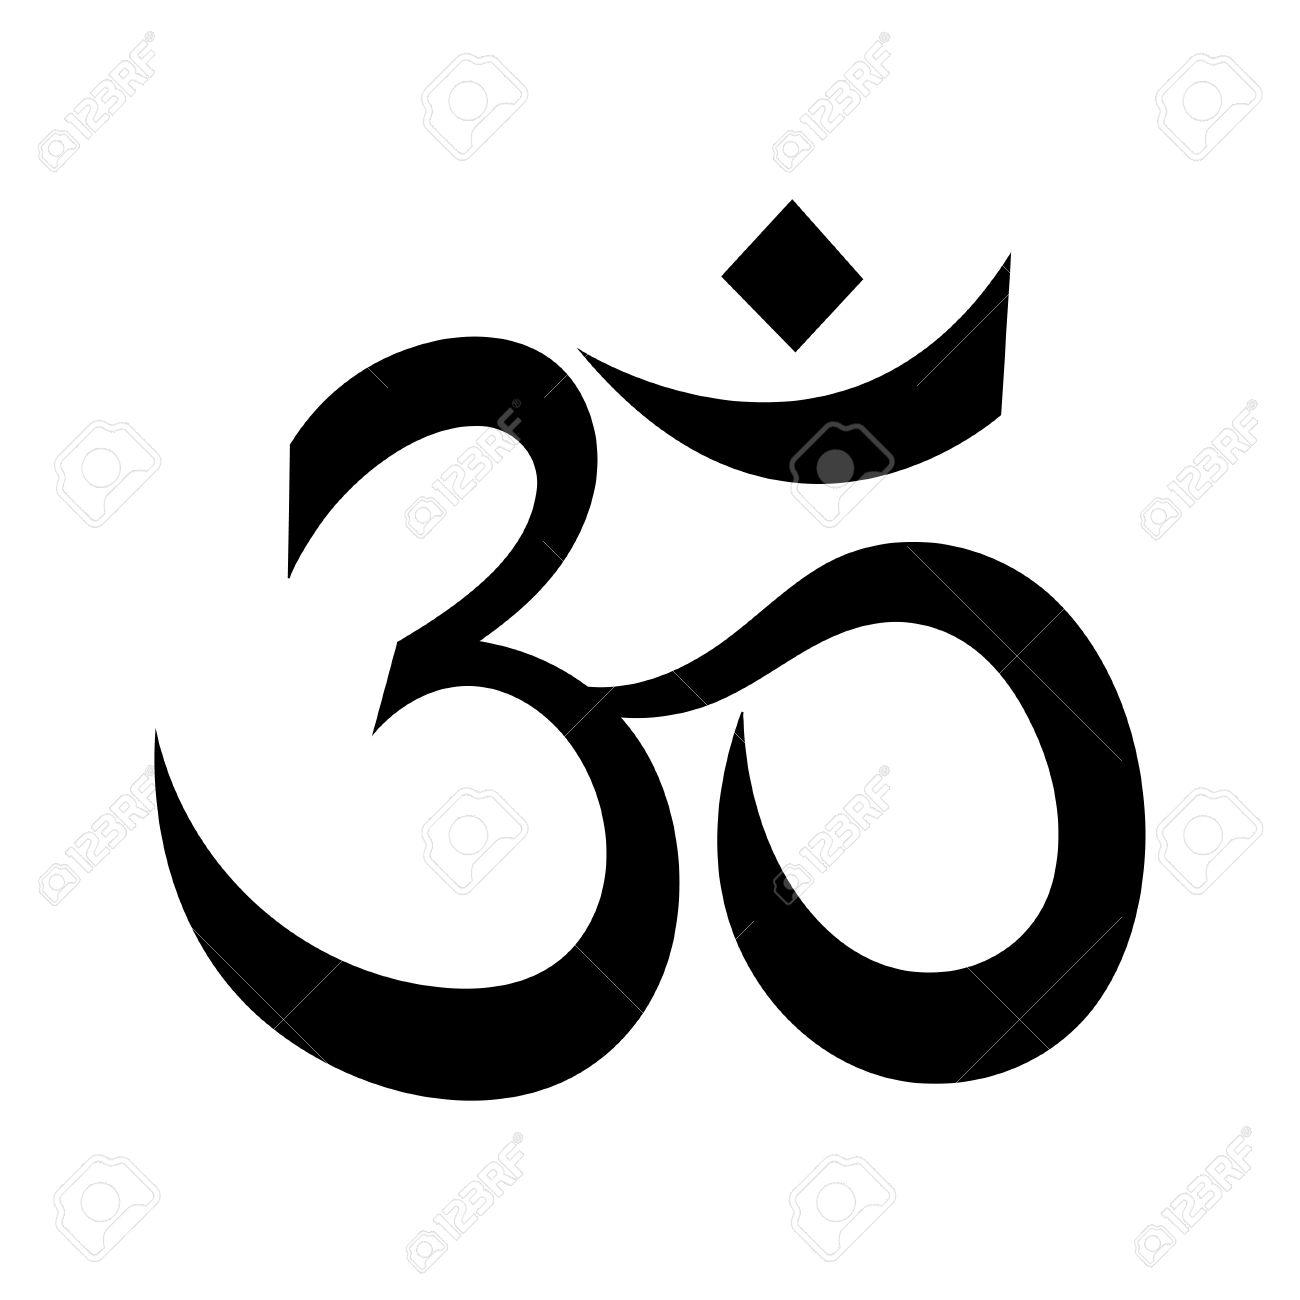 The symbol of the divine triad of brahma vishnu and shiva the symbol of the divine triad of brahma vishnu and shiva stock vector biocorpaavc Gallery